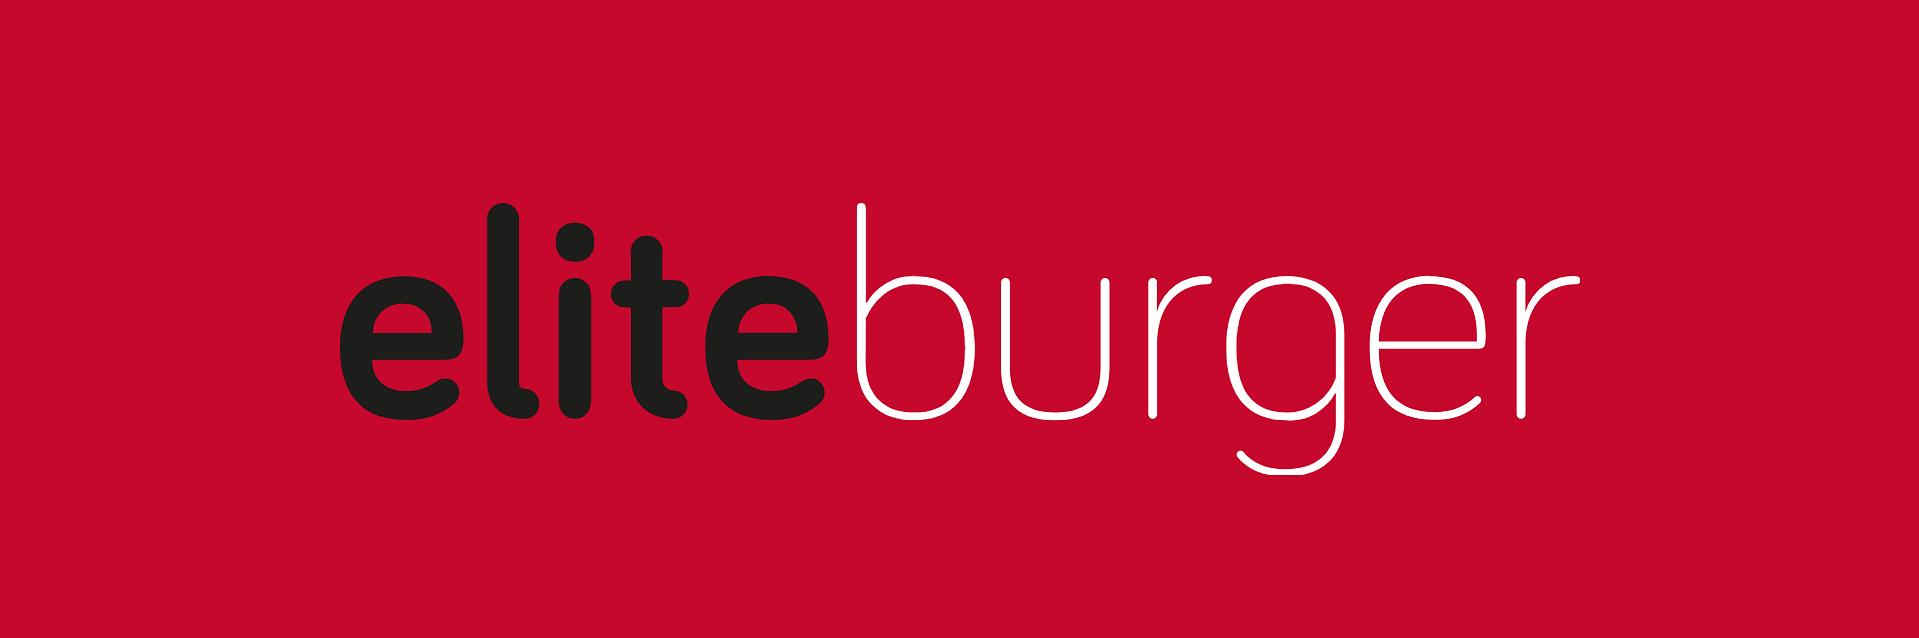 Restaurant eliteburger